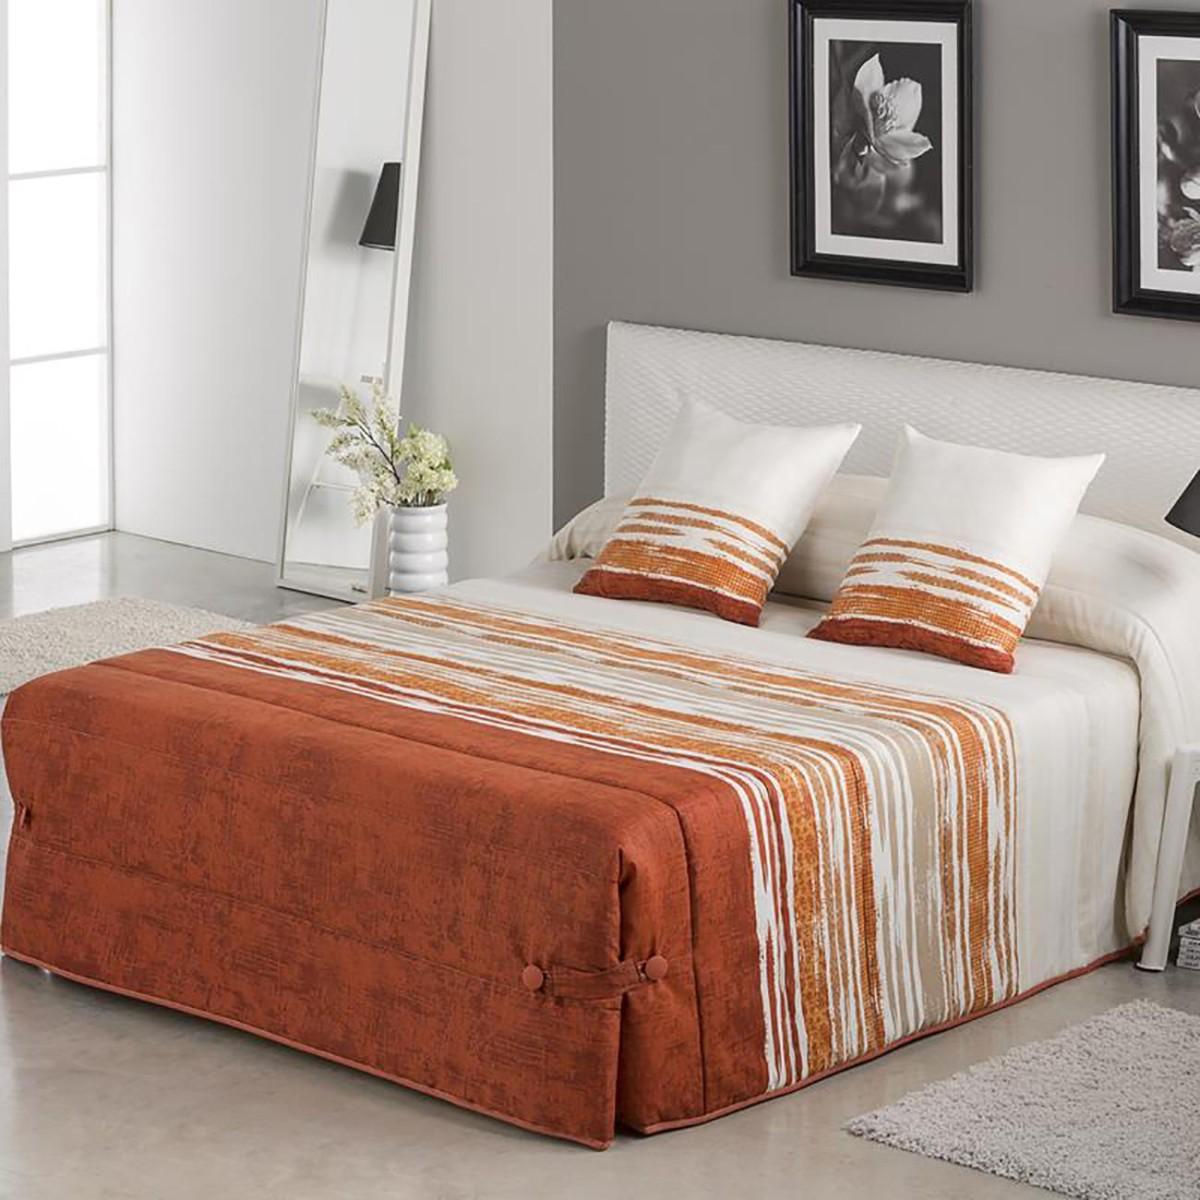 Conforter FANCY JVR